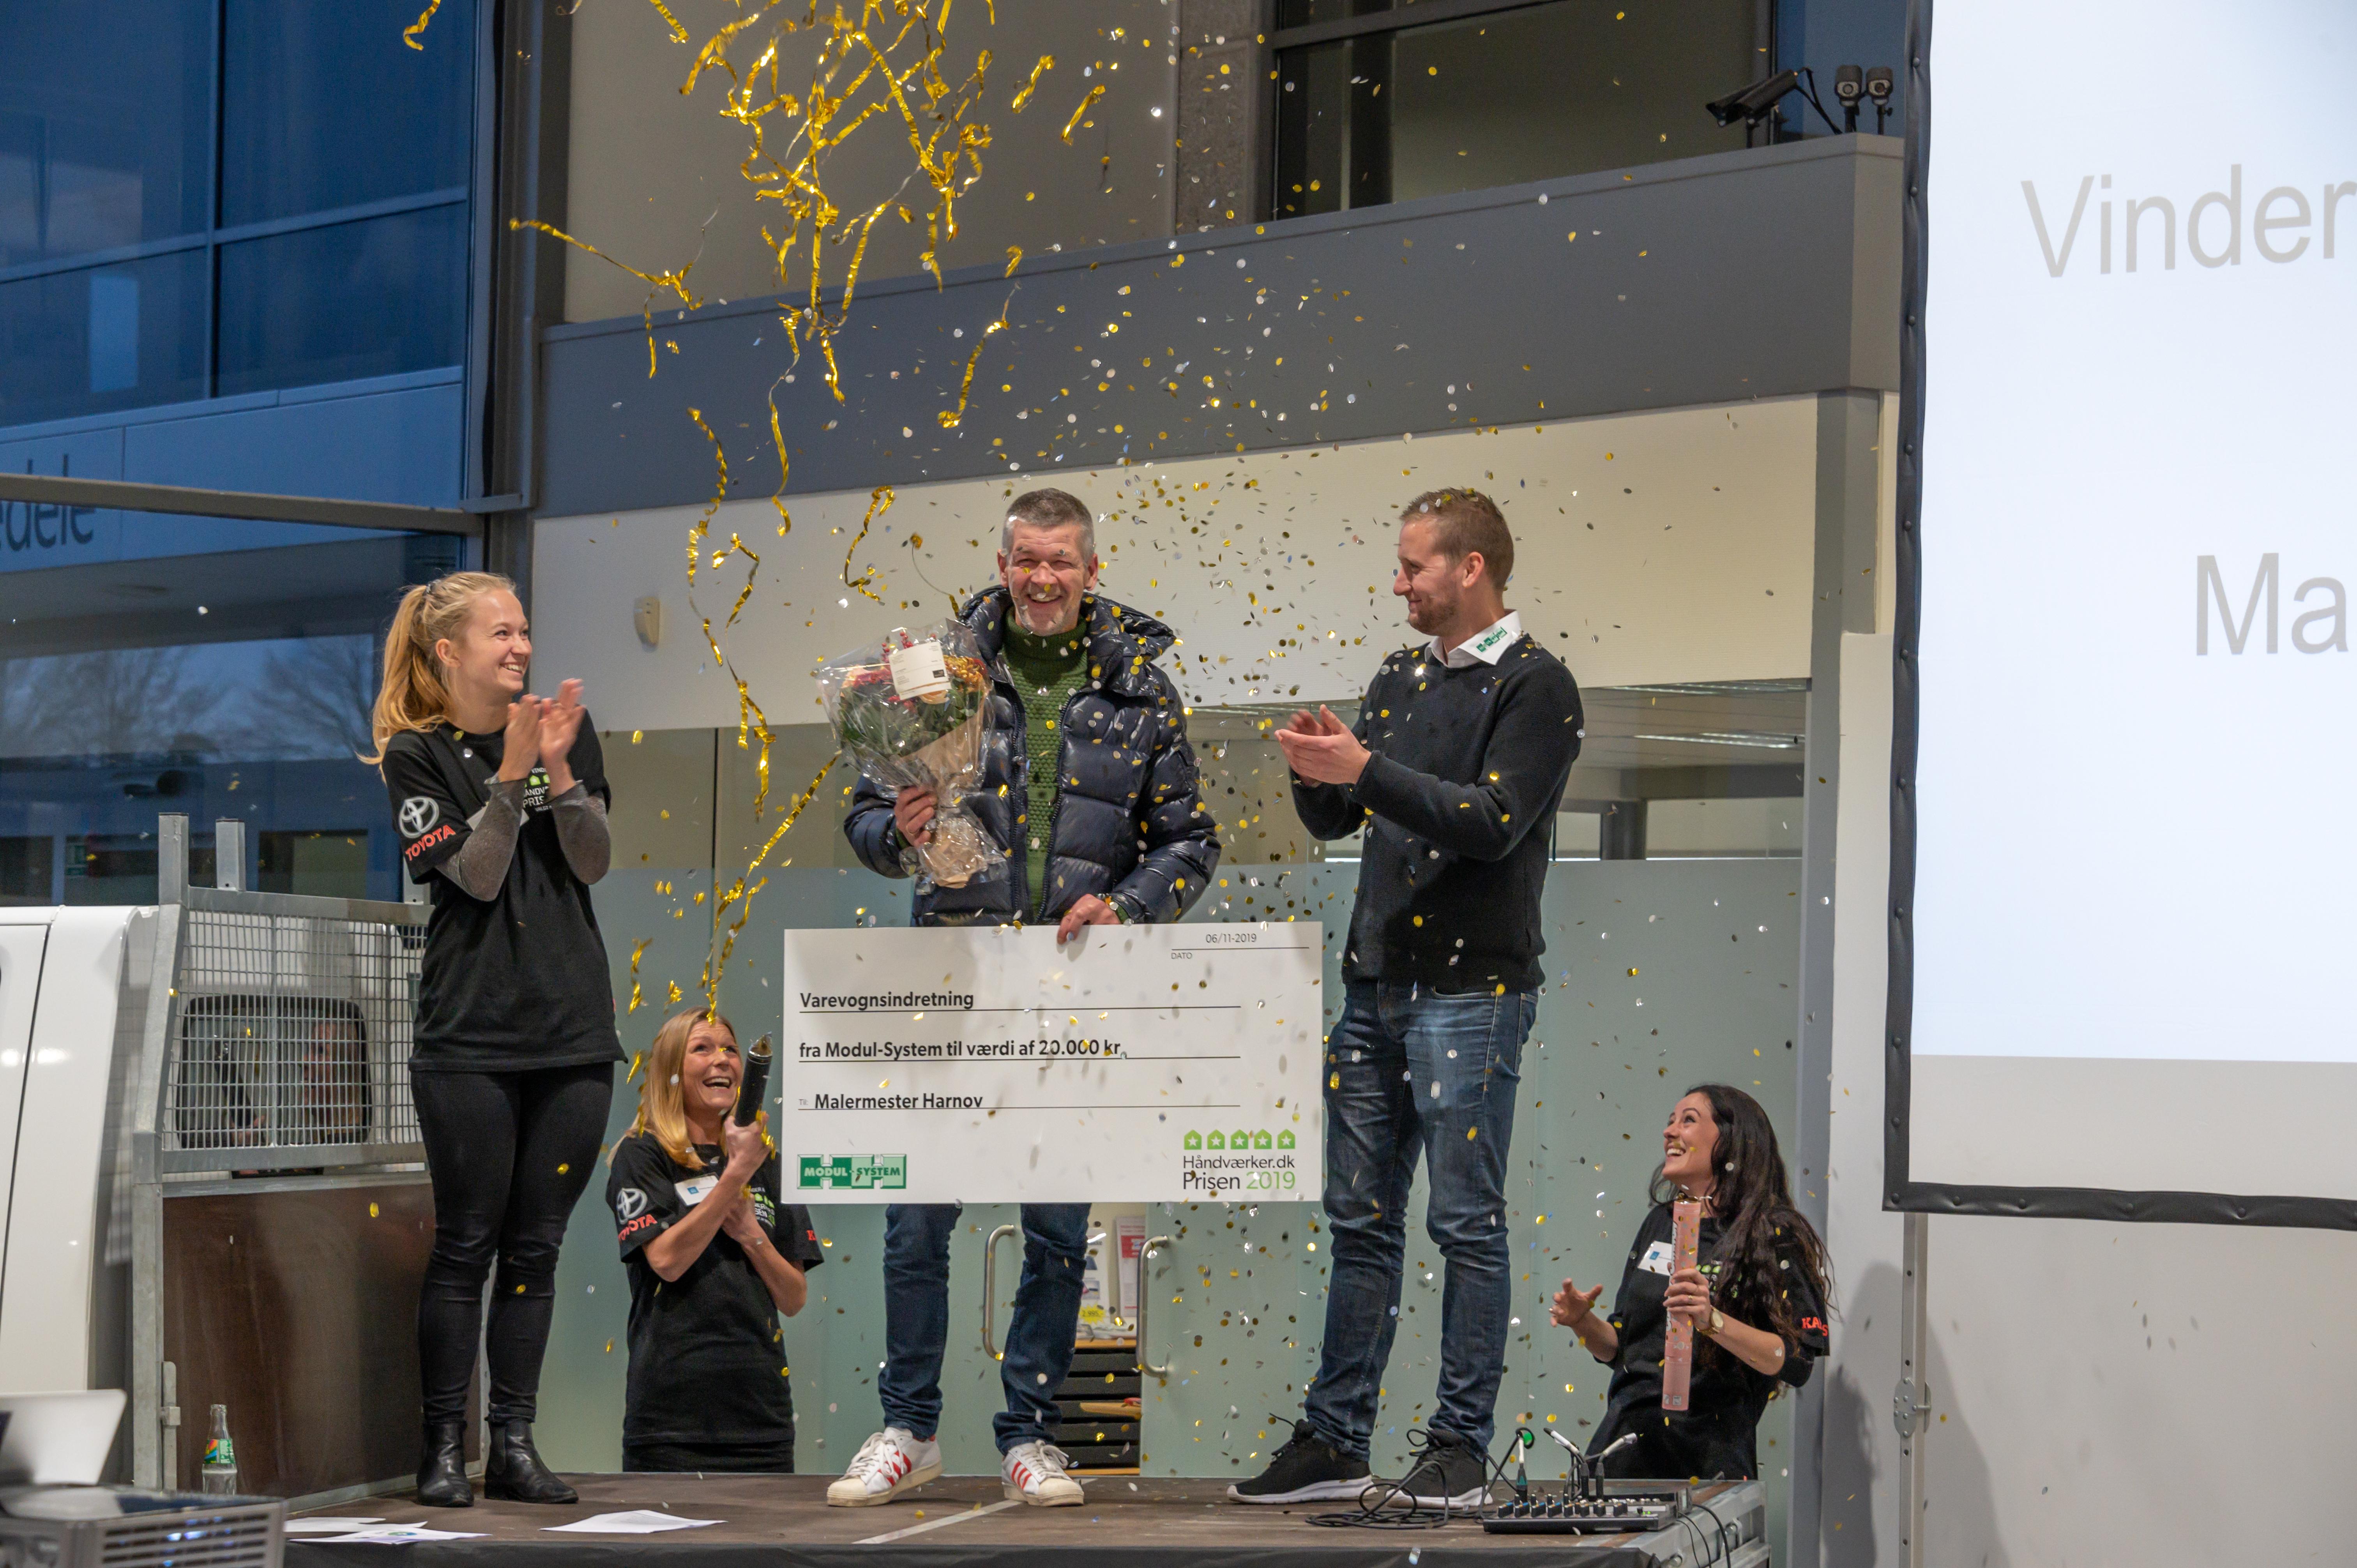 haandvaerker-prisen 2019